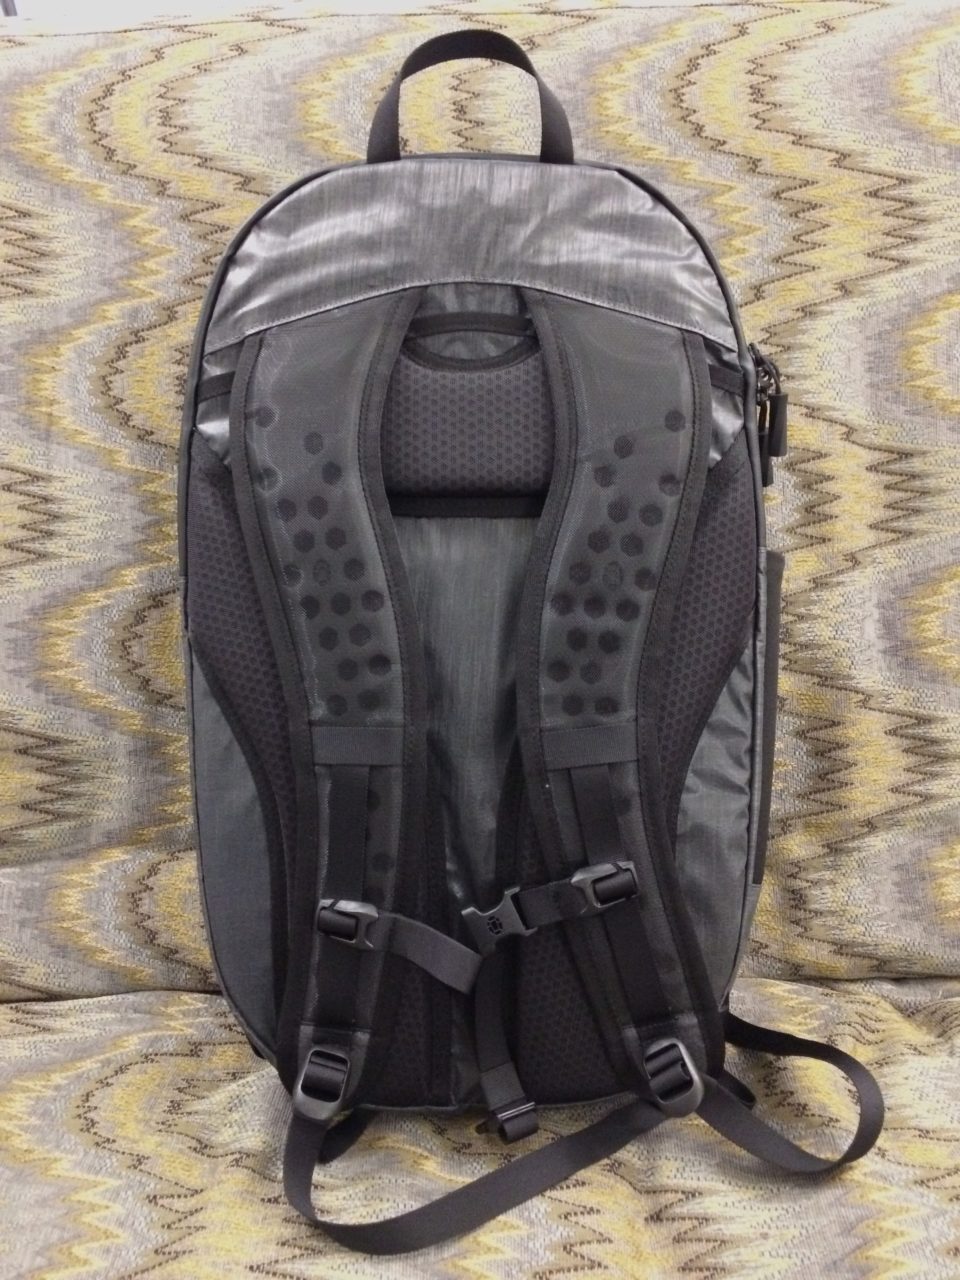 Tortuga Homebase Backpack straps